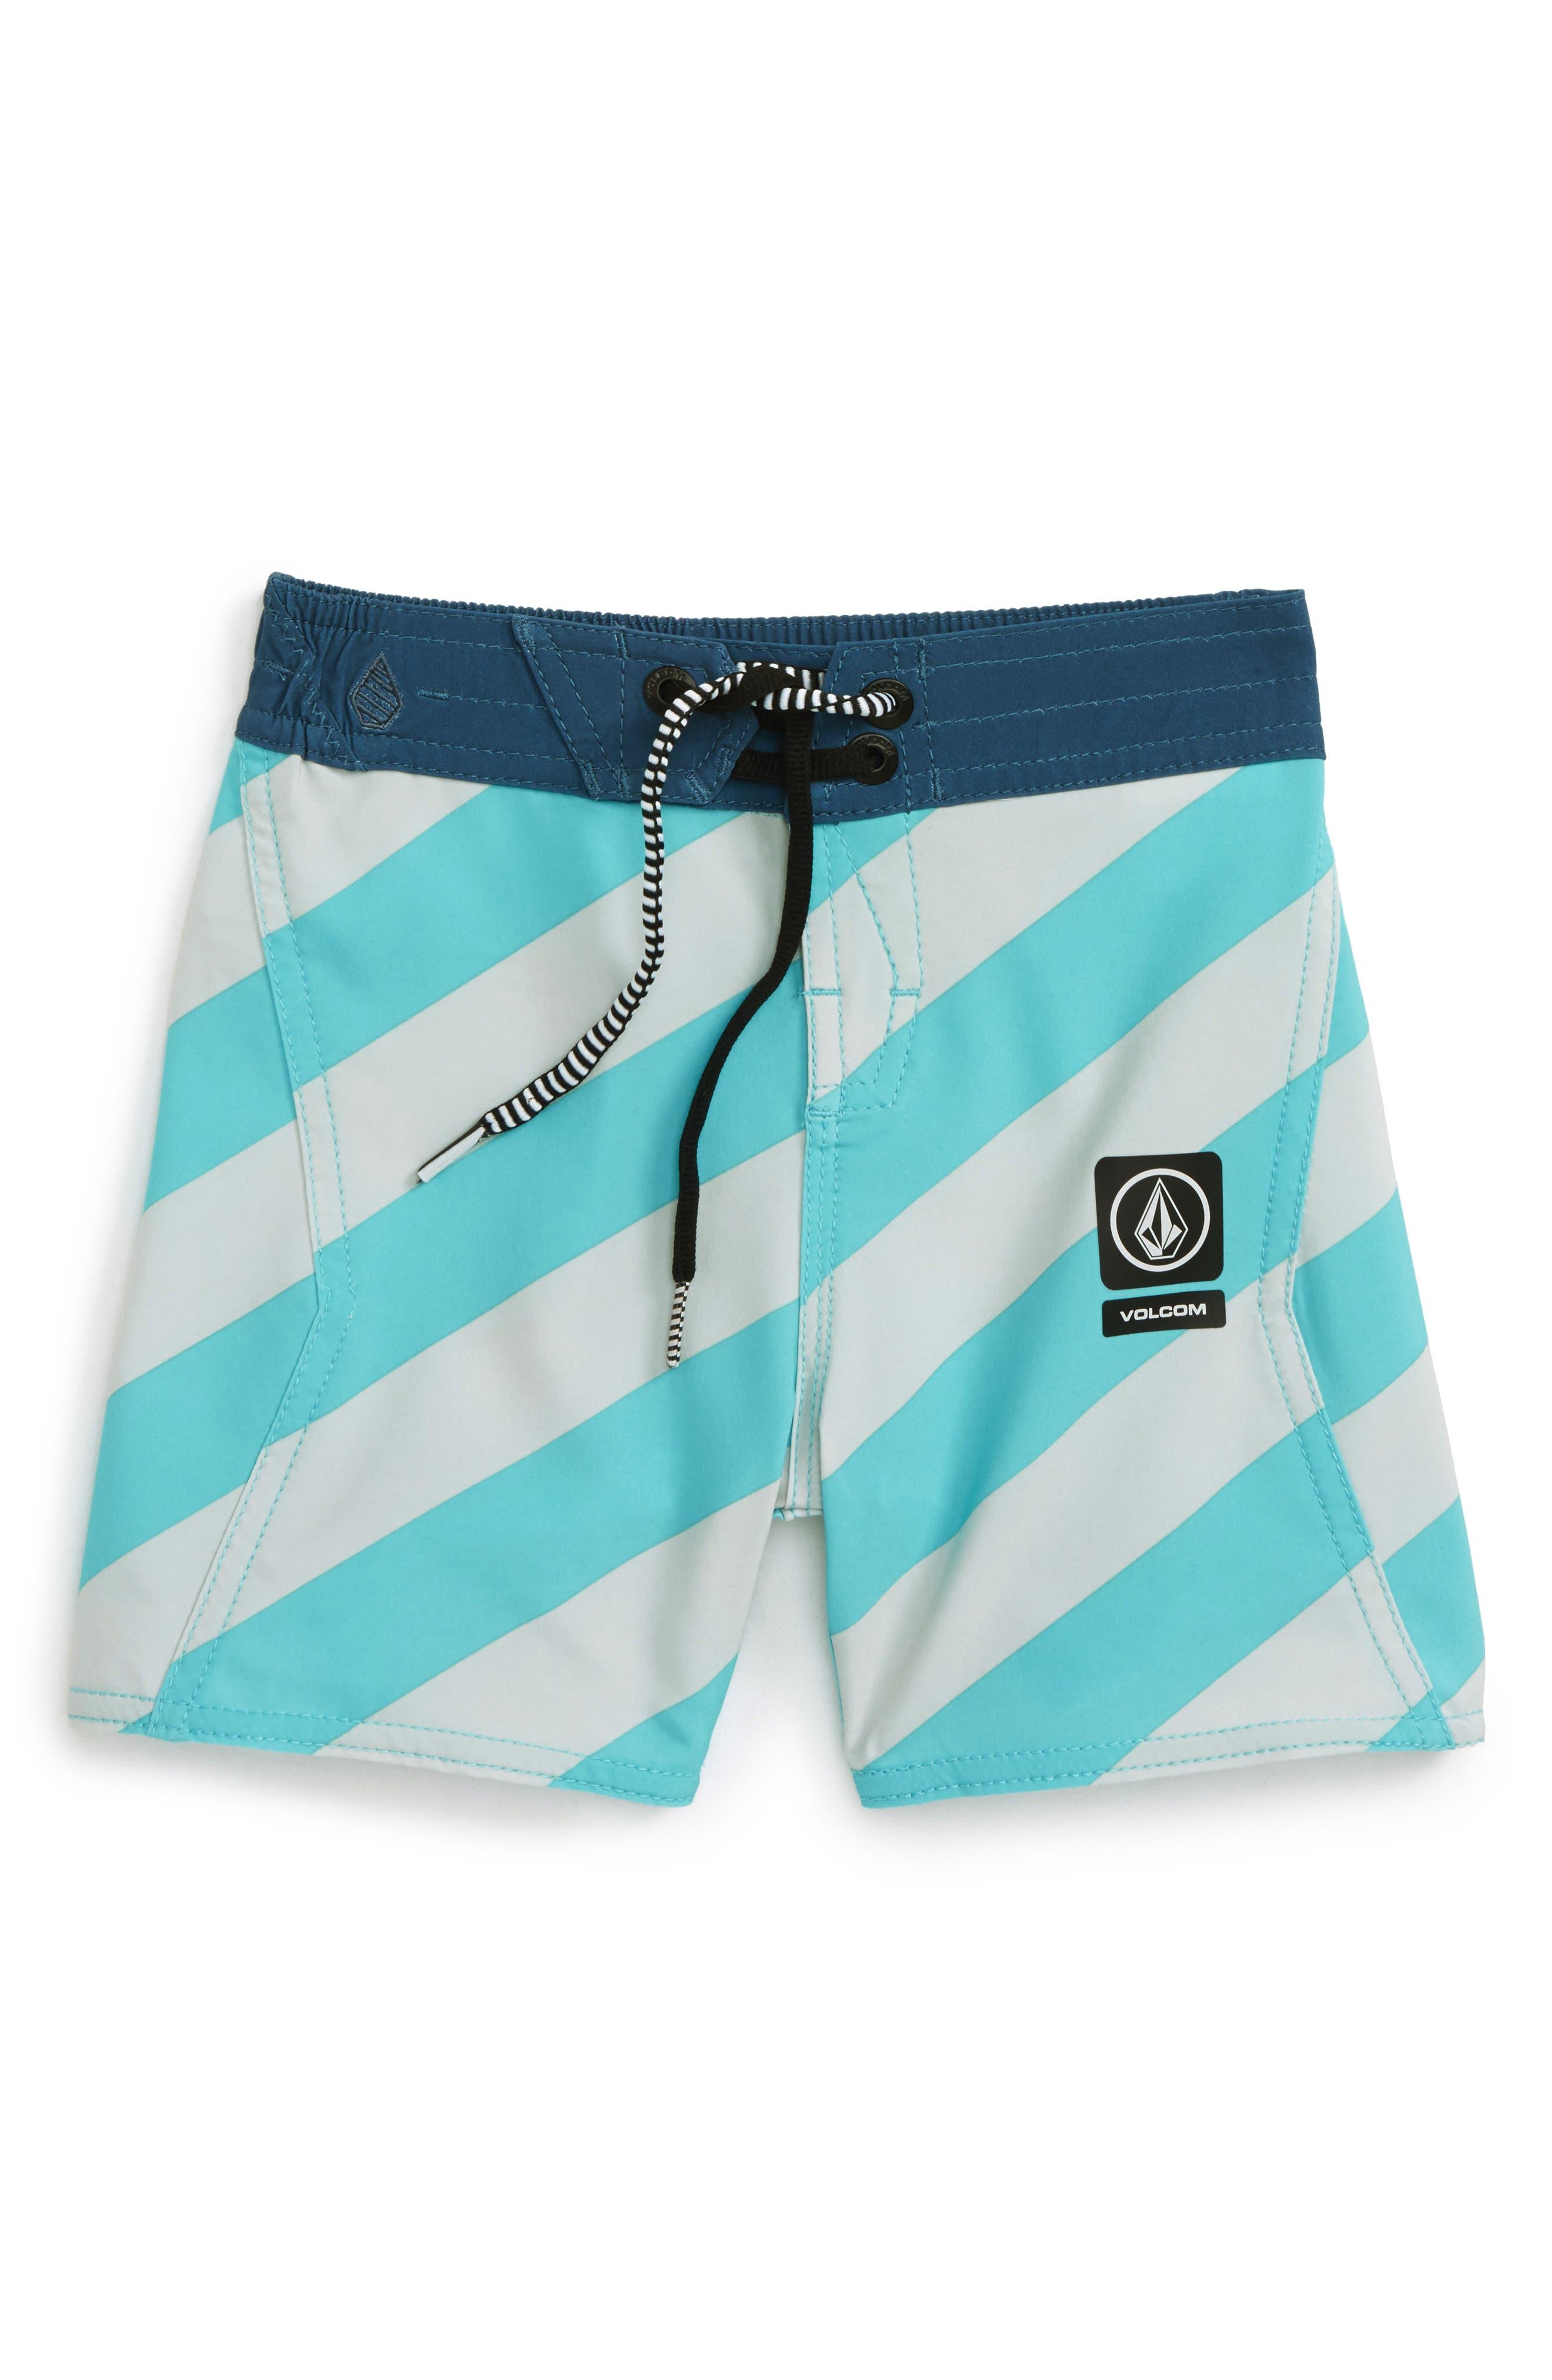 Stripey Jammer Board Shorts,                             Main thumbnail 1, color,                             440